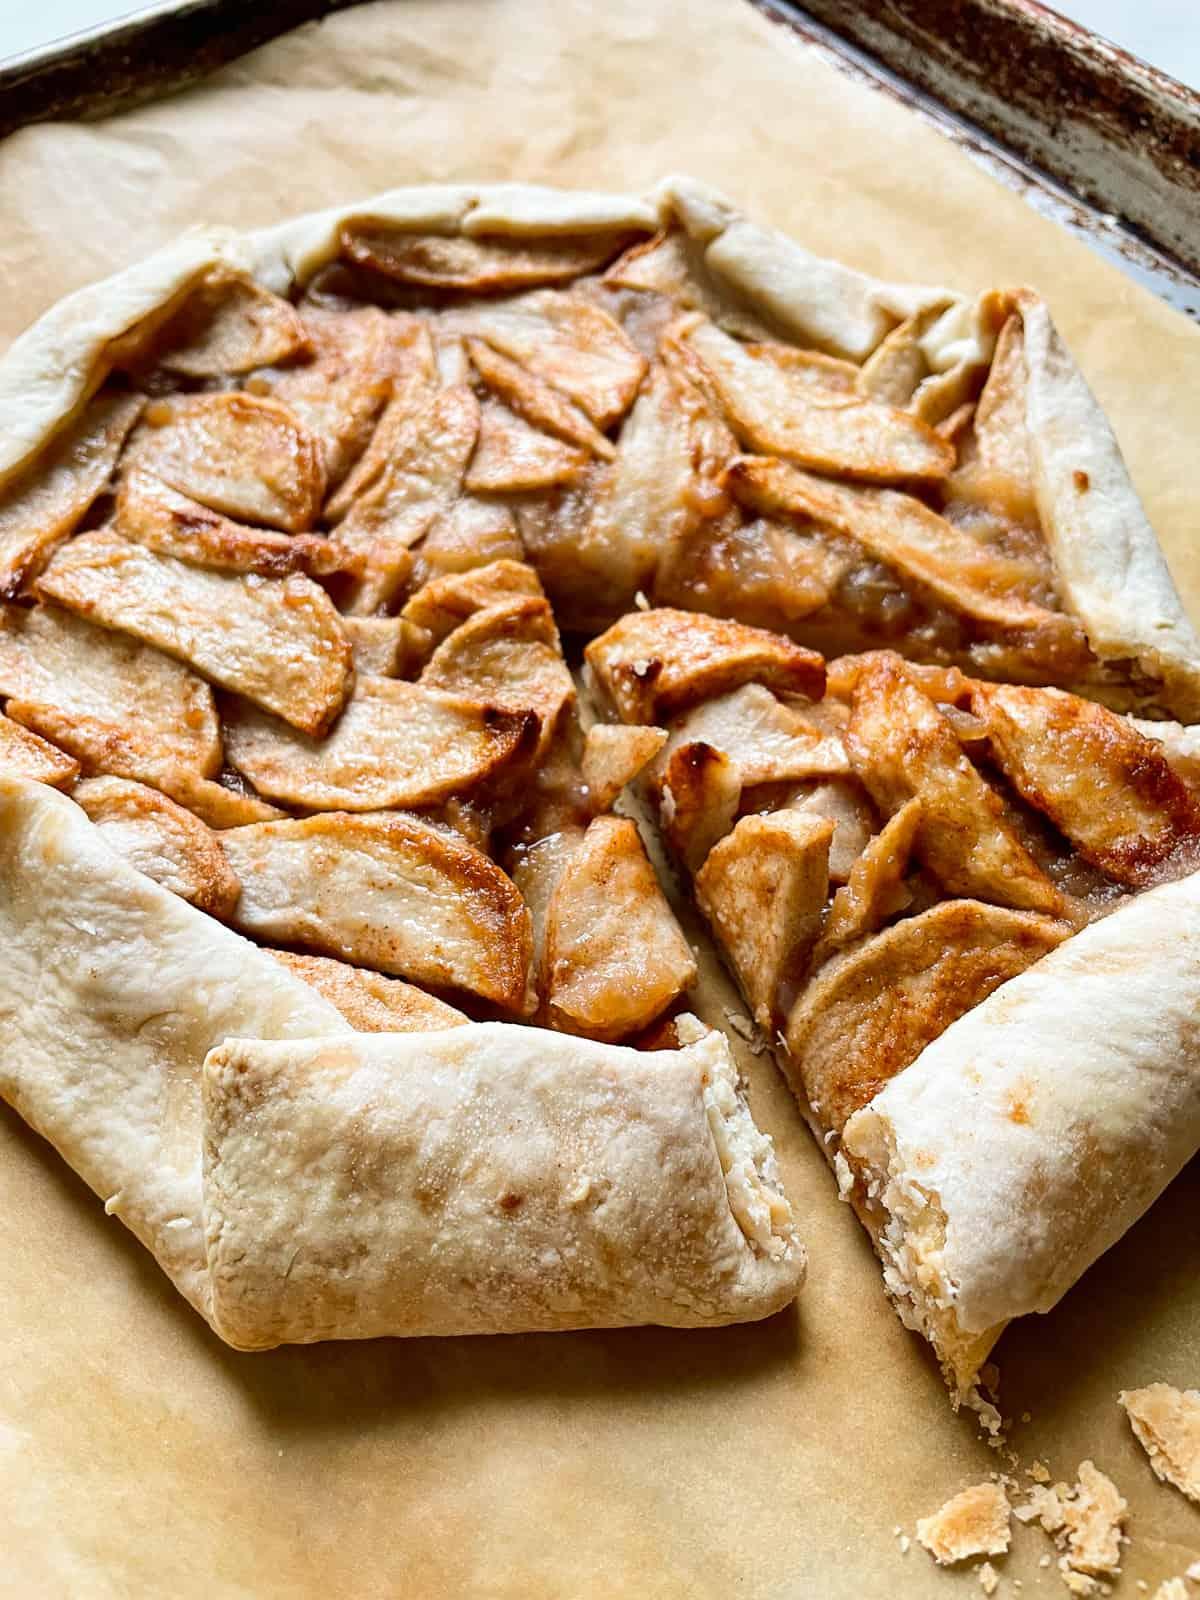 Apple galette sliced on a baking sheet.